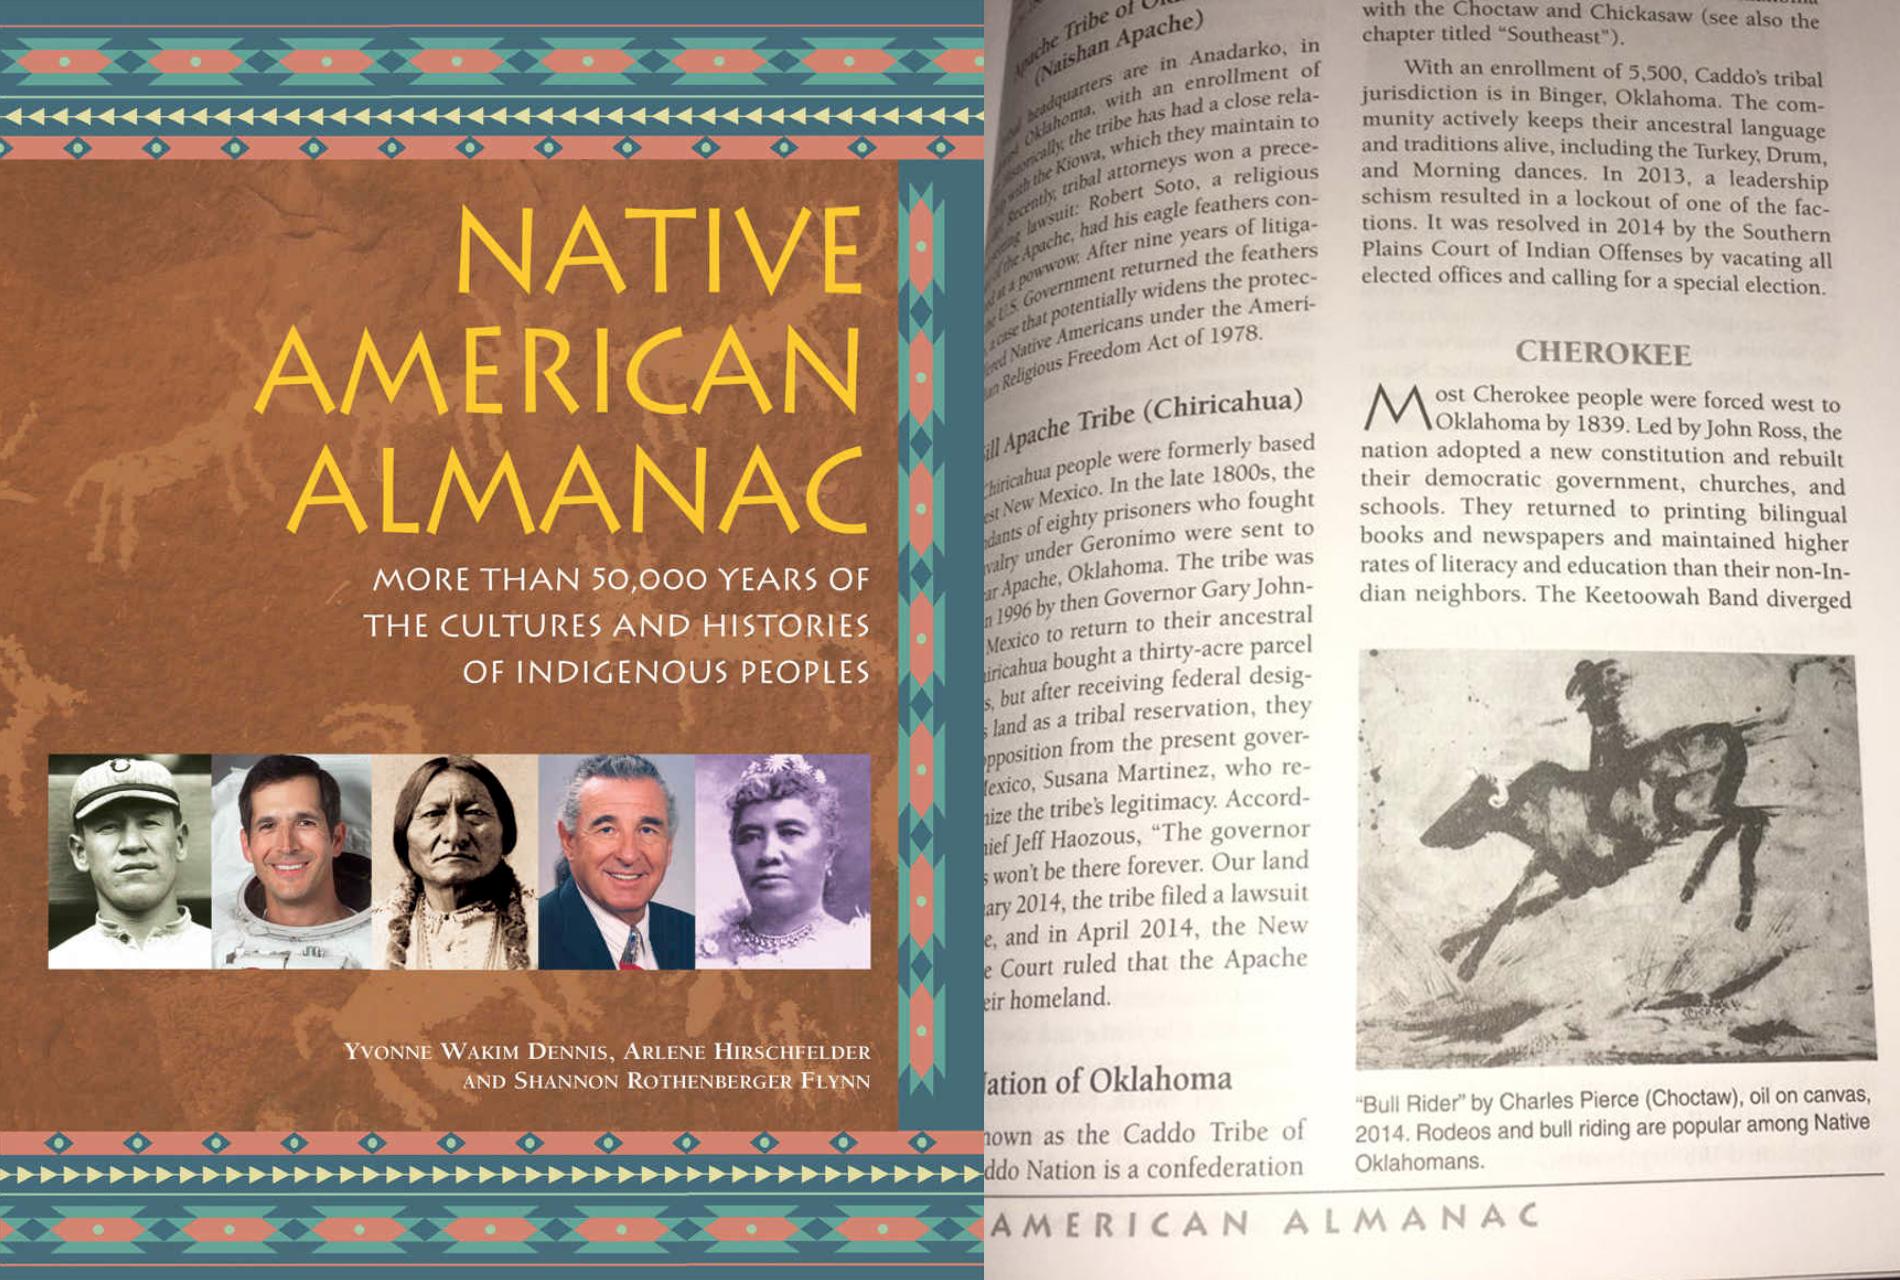 native american almanac.png